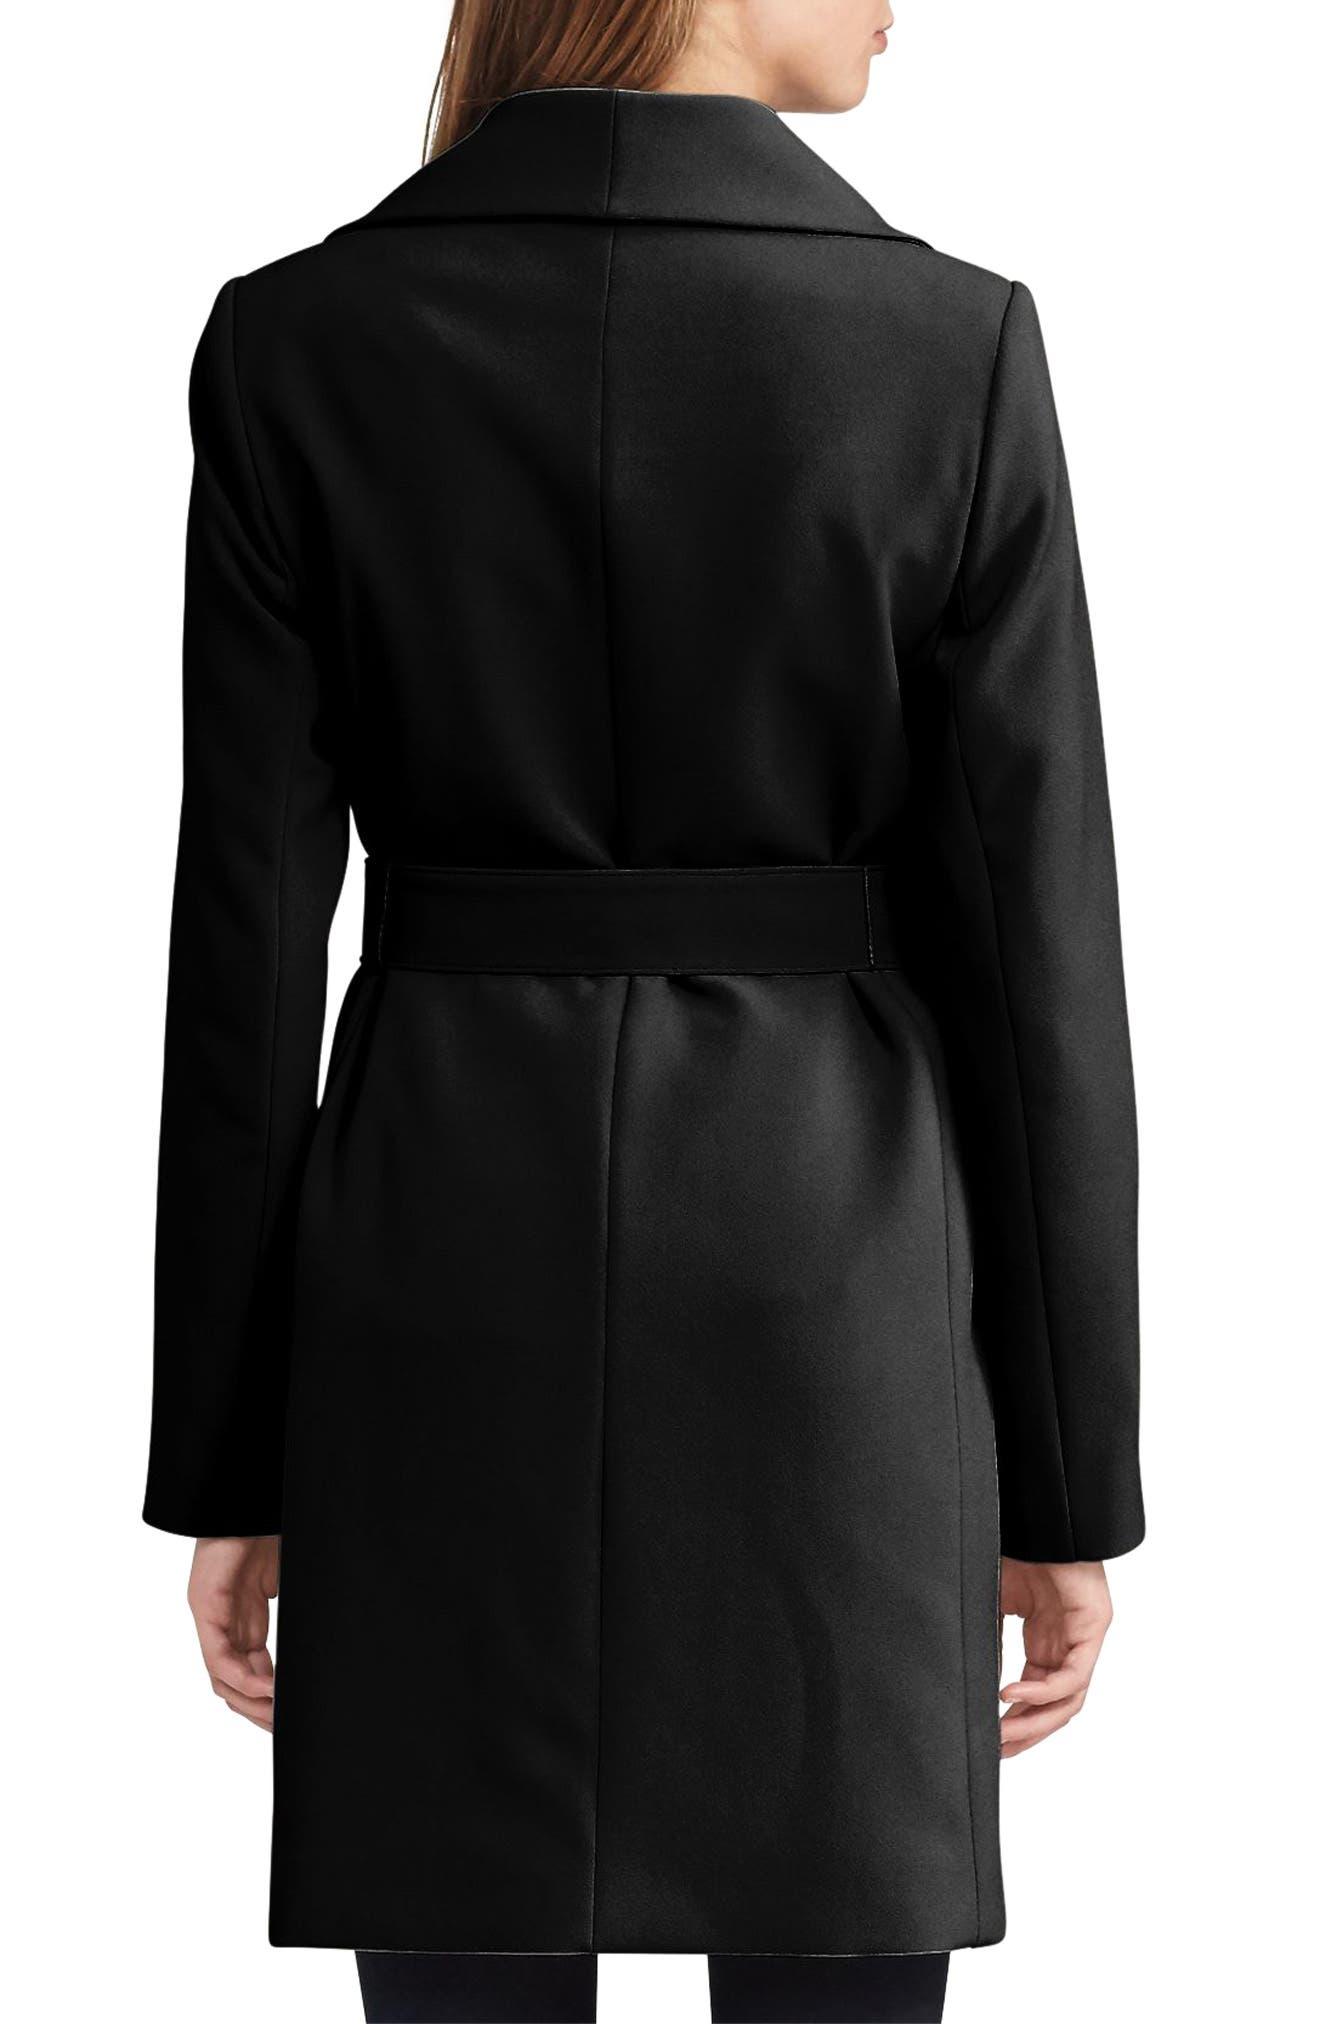 LAUREN RALPH LAUREN, Belted Drape Front Coat, Alternate thumbnail 2, color, 002